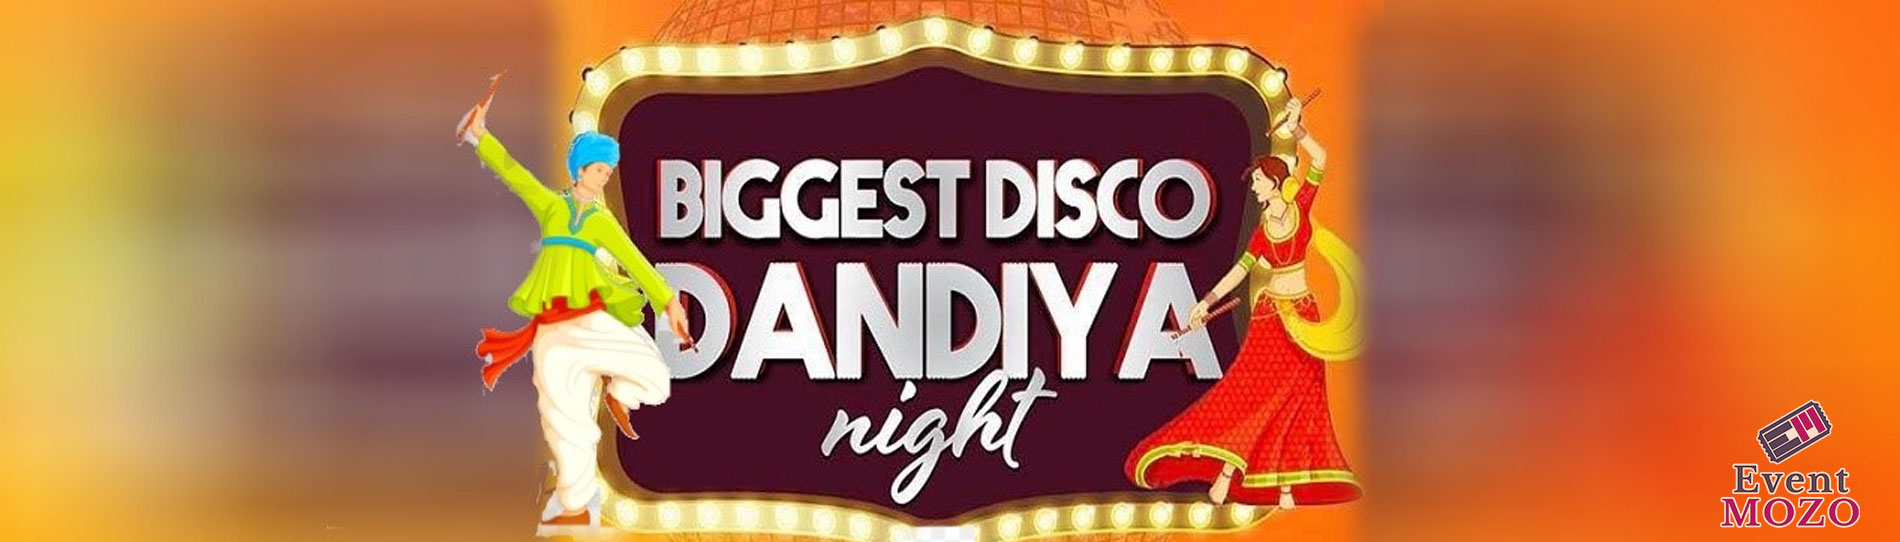 EventMozo Disco Dandiya in the Club